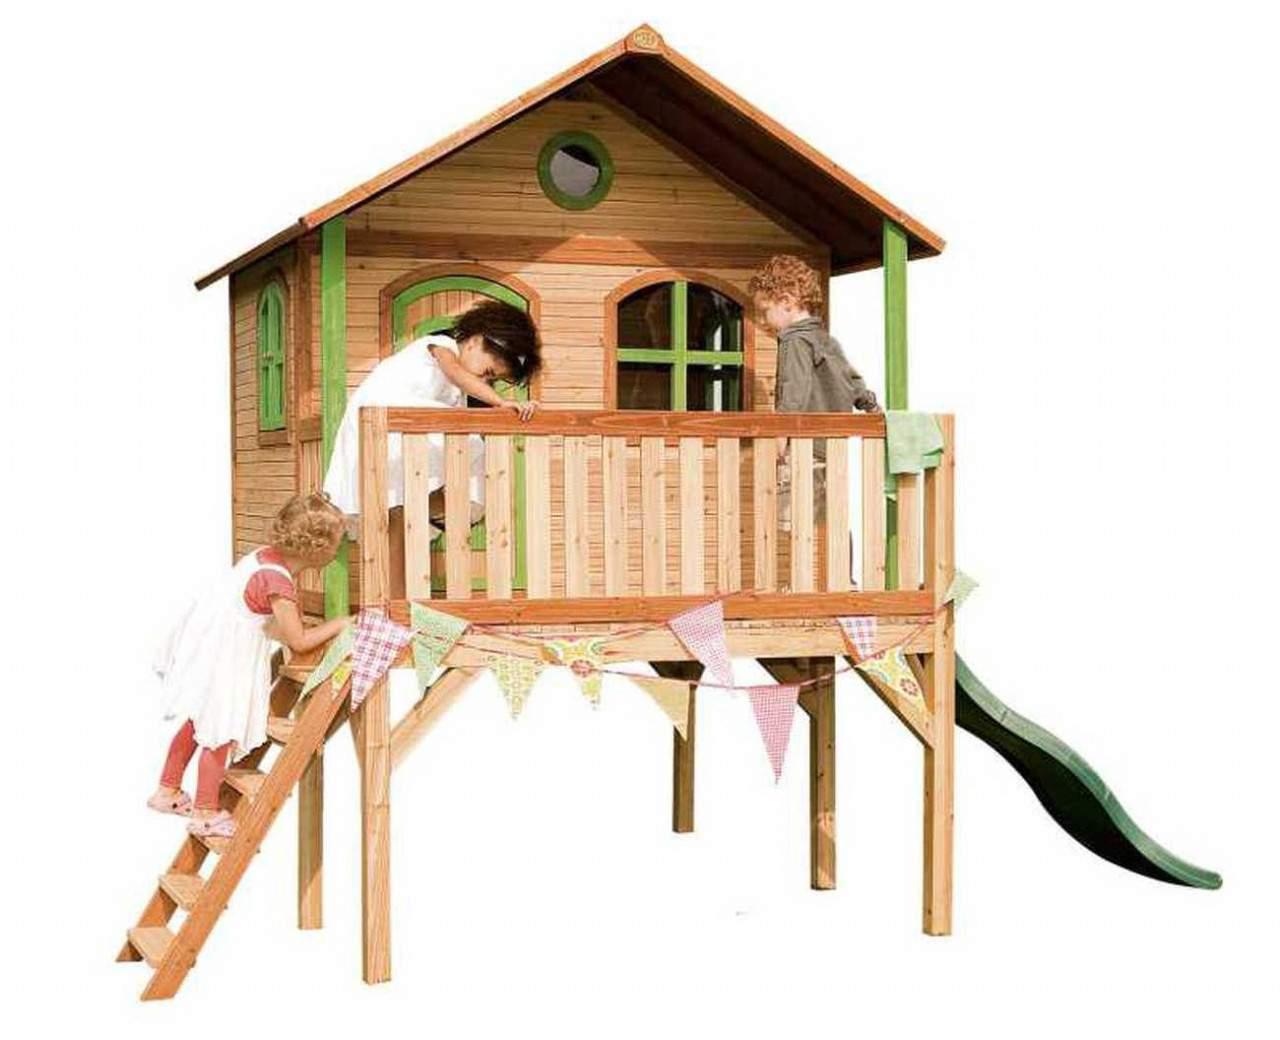 Stelzenhaus Garten Inspirierend Kinder Stelzenhaus Axi sophie Rutsche 1 75 M